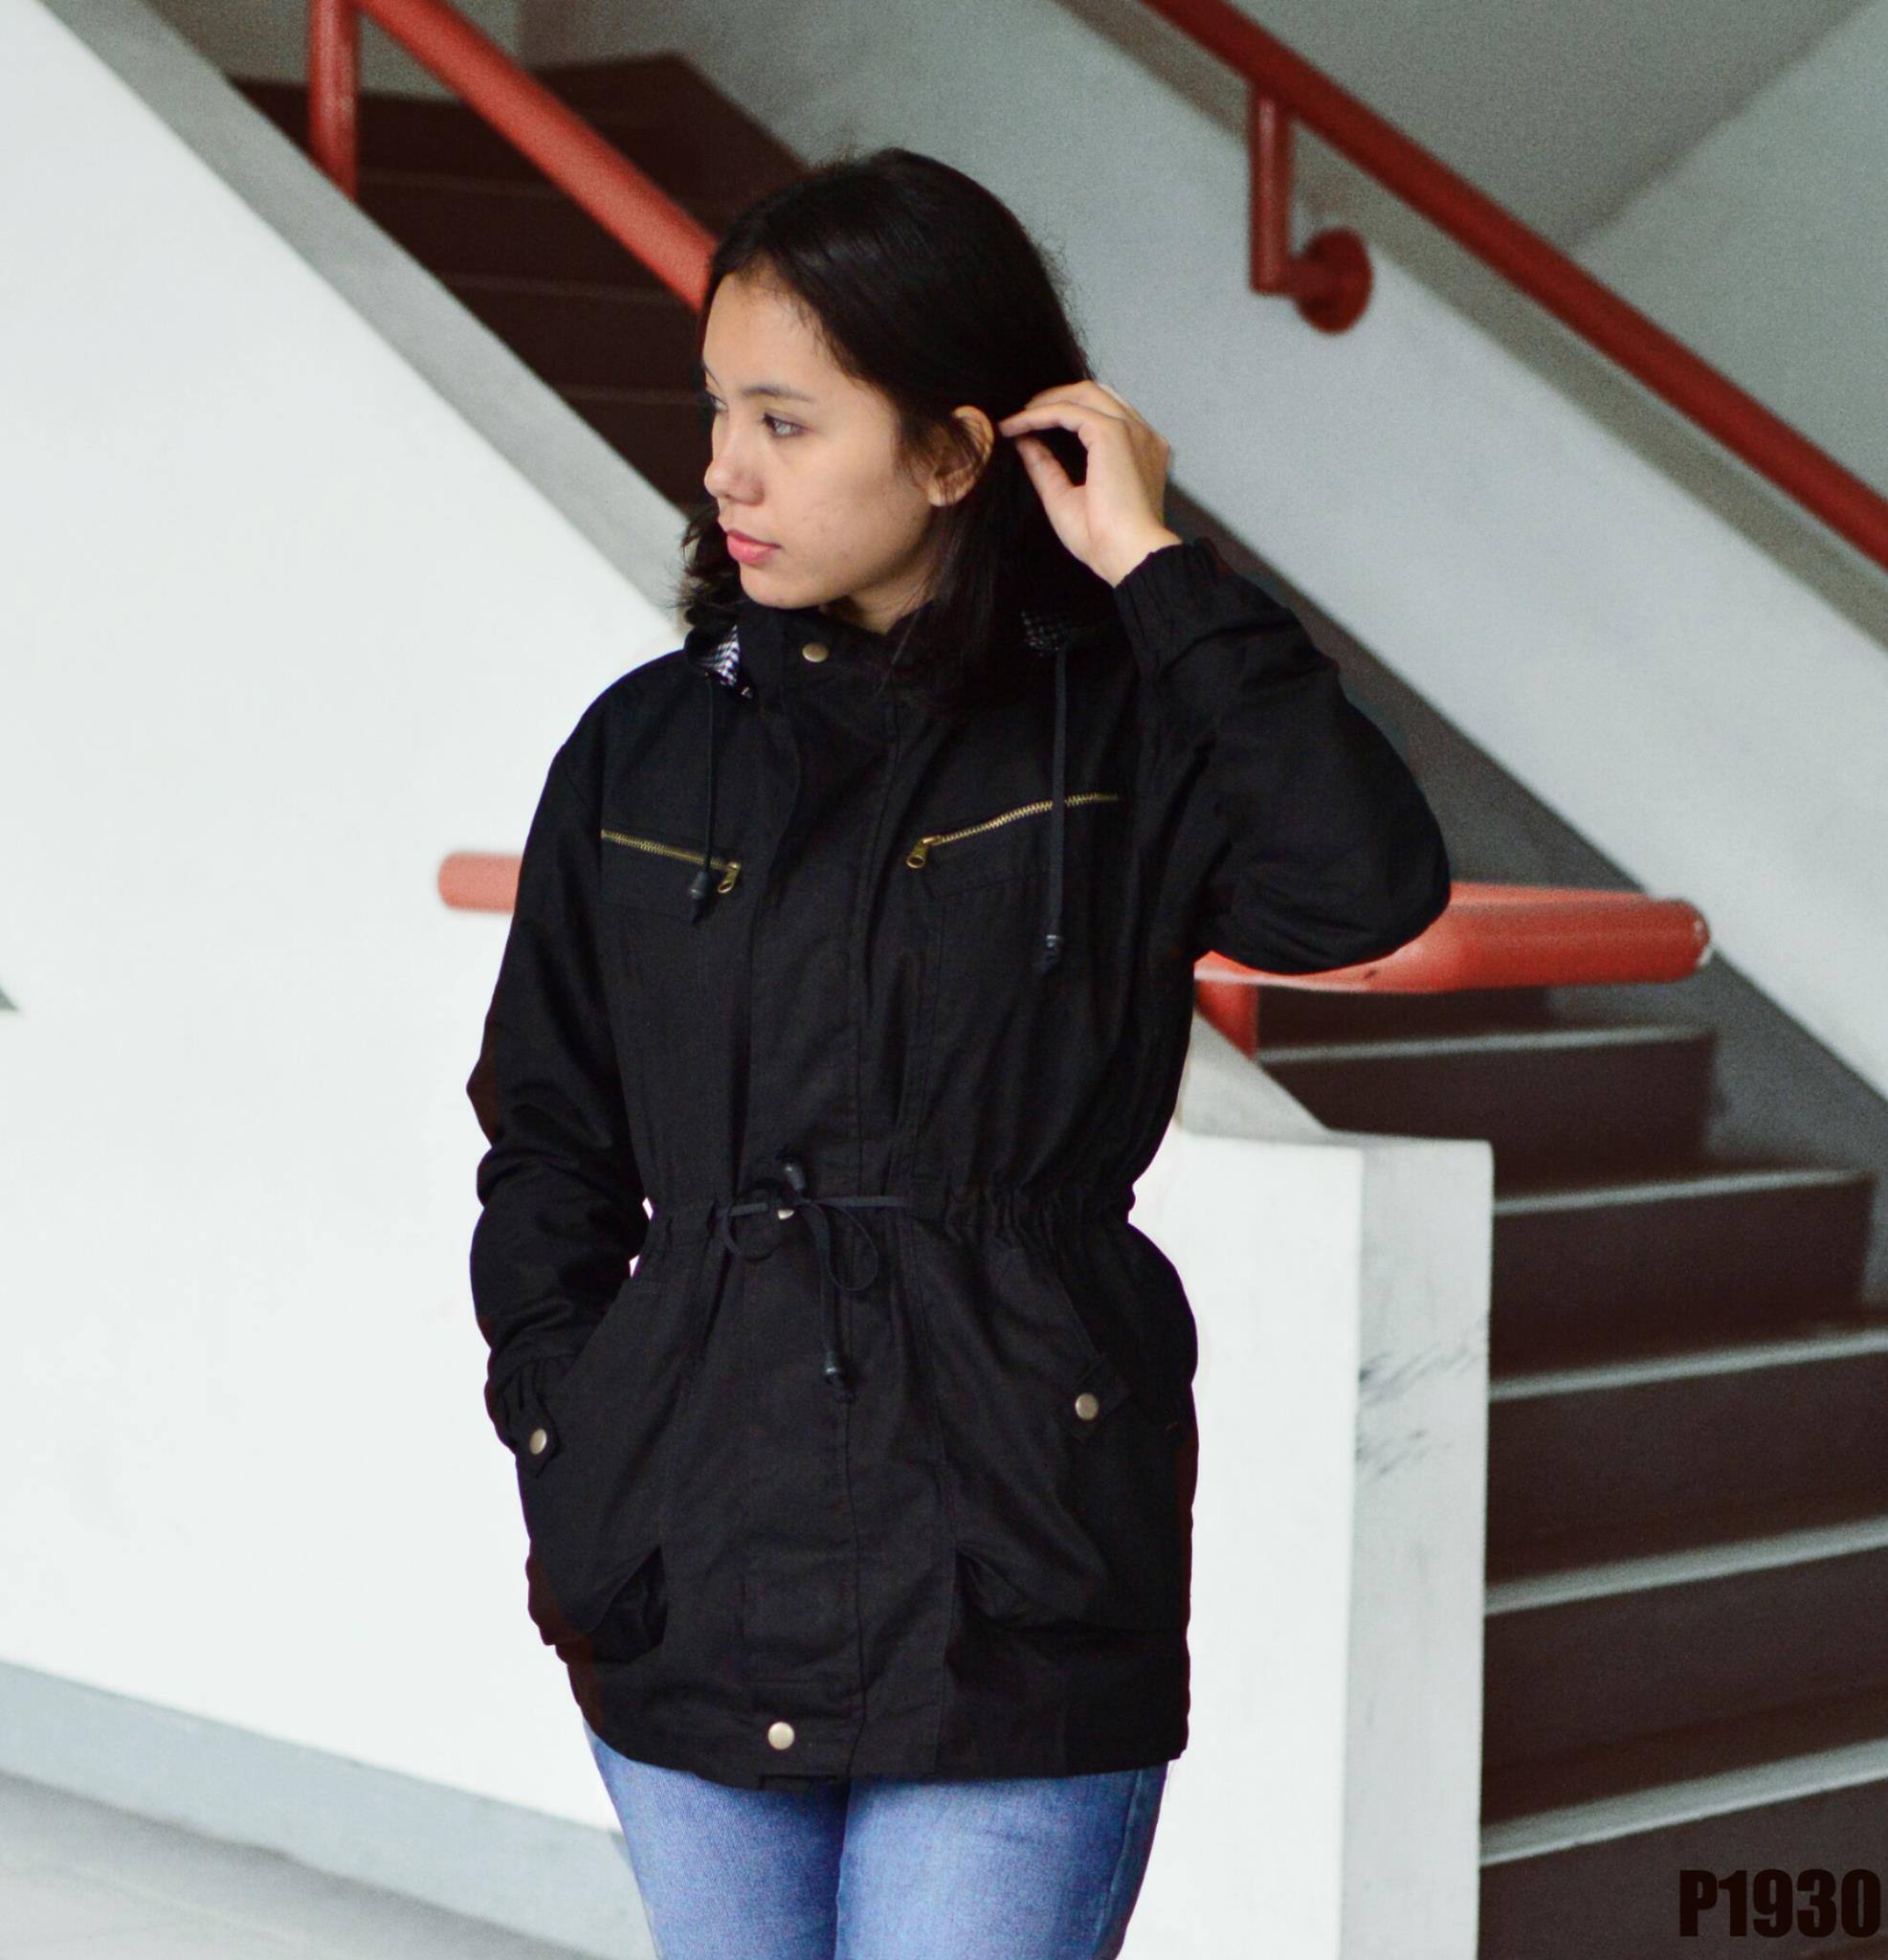 Km 24 Cloth Shop Line Jaket Parka Wanita Warna Merah Maroon Hitam